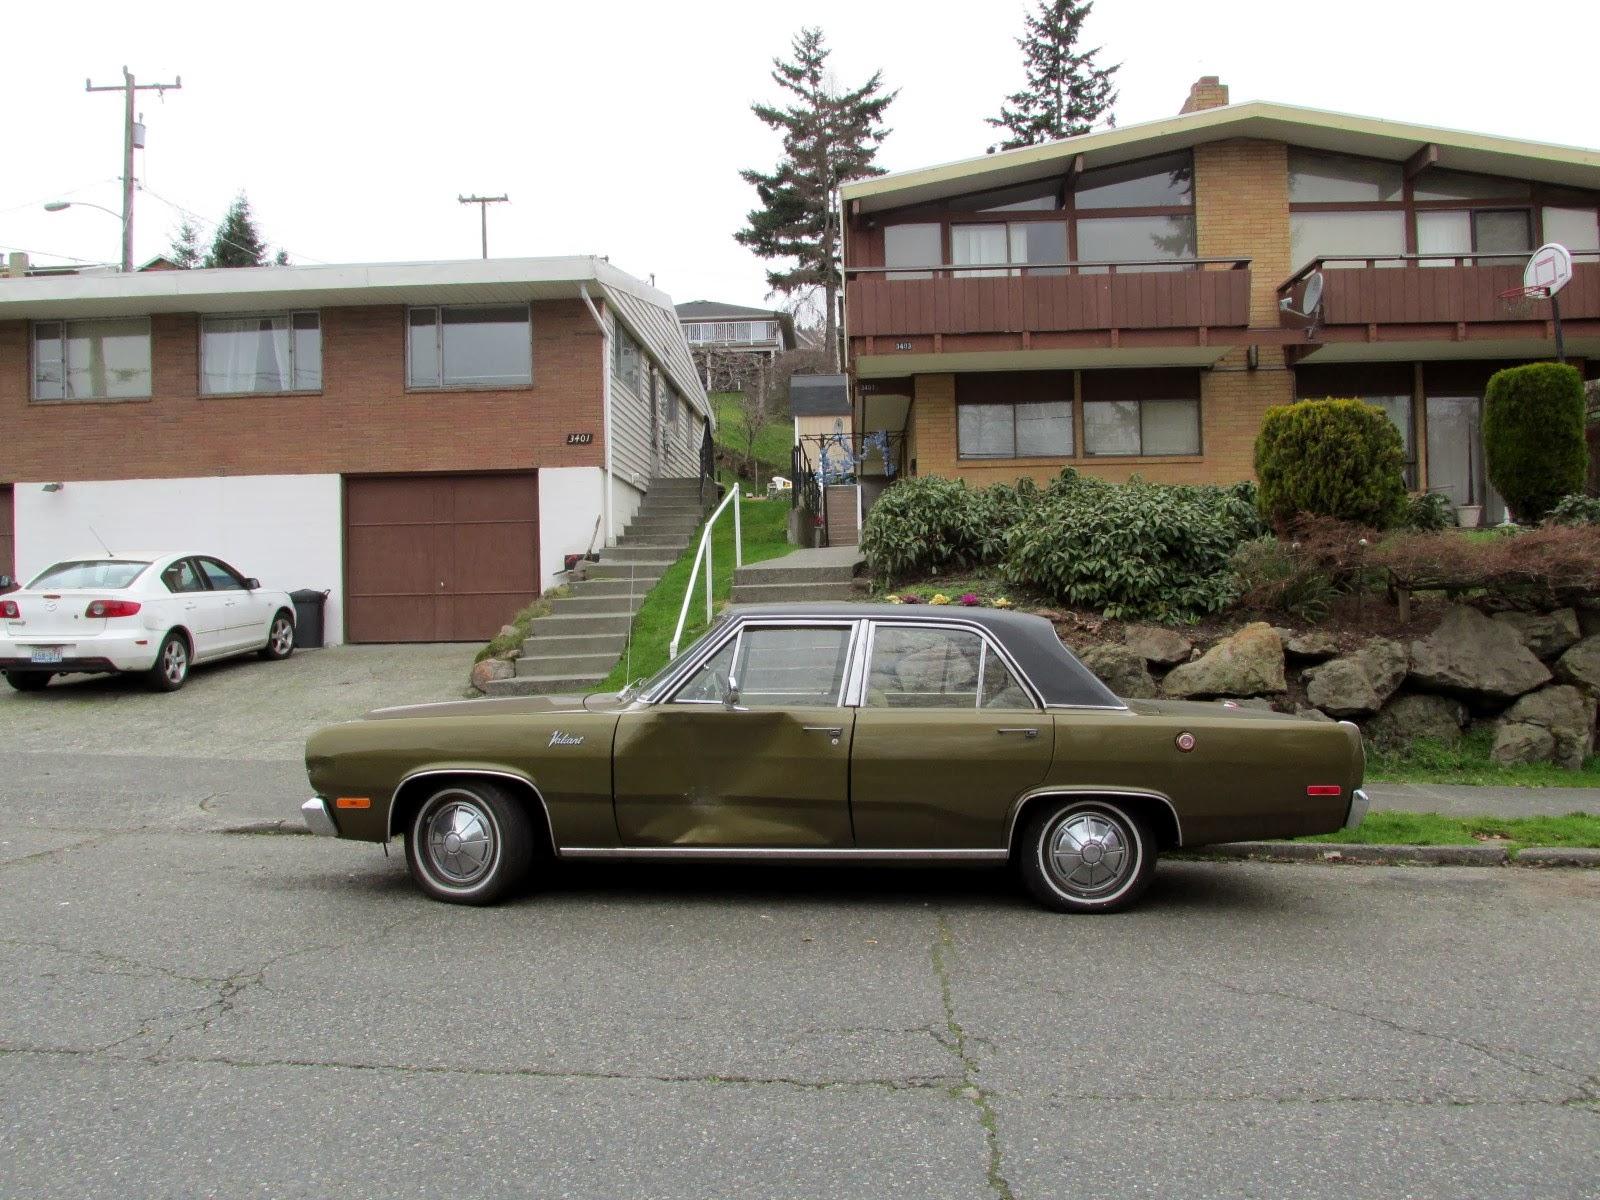 1970 plymouth valiant sedan [ 1600 x 1200 Pixel ]